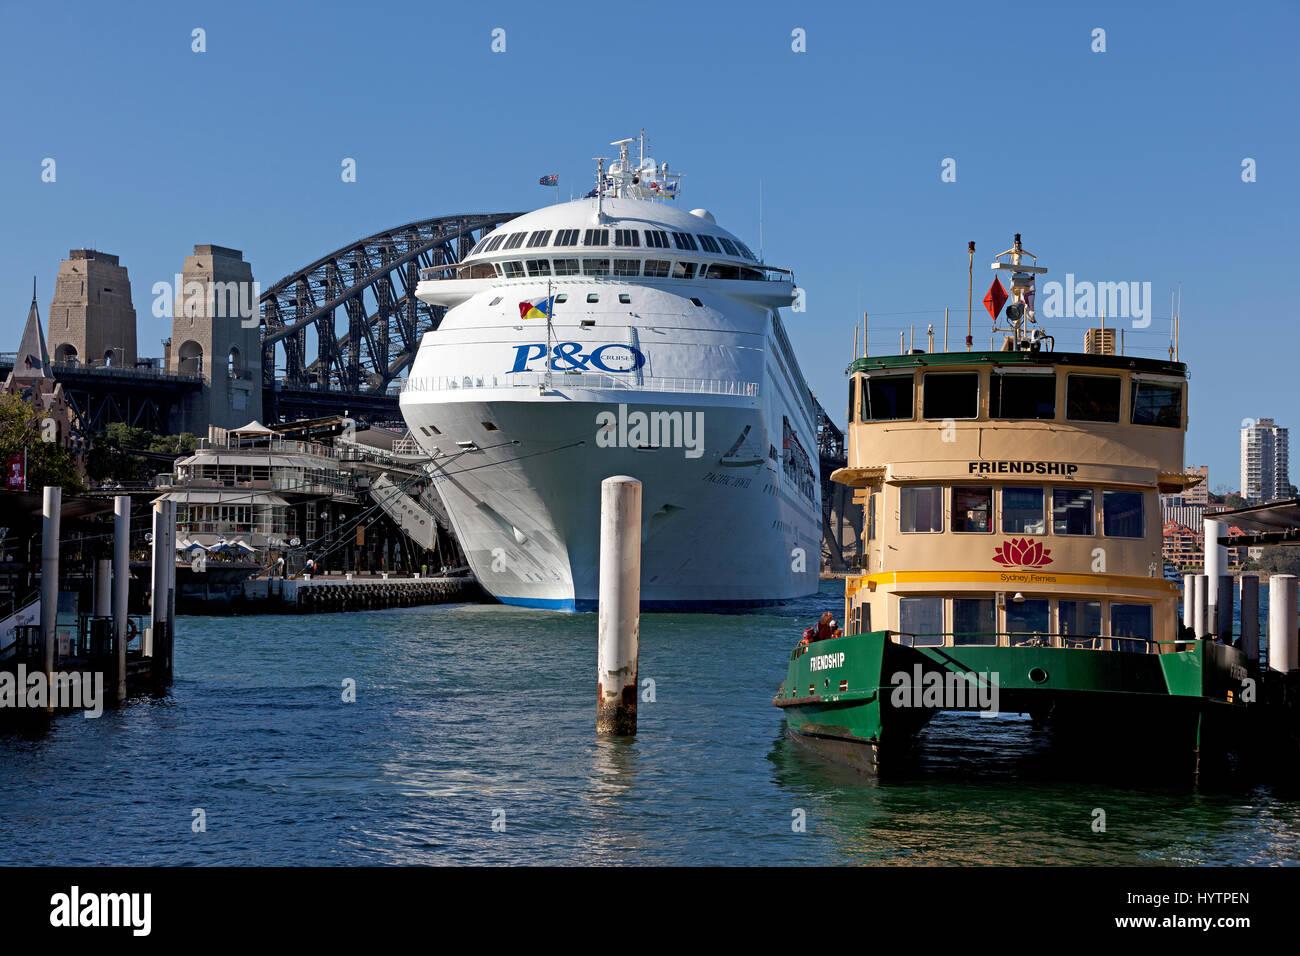 P&O Pacific Jewel cruise and City ferry at Circular Quay, Sydney Harbour Bridge background, Australia - Stock Image